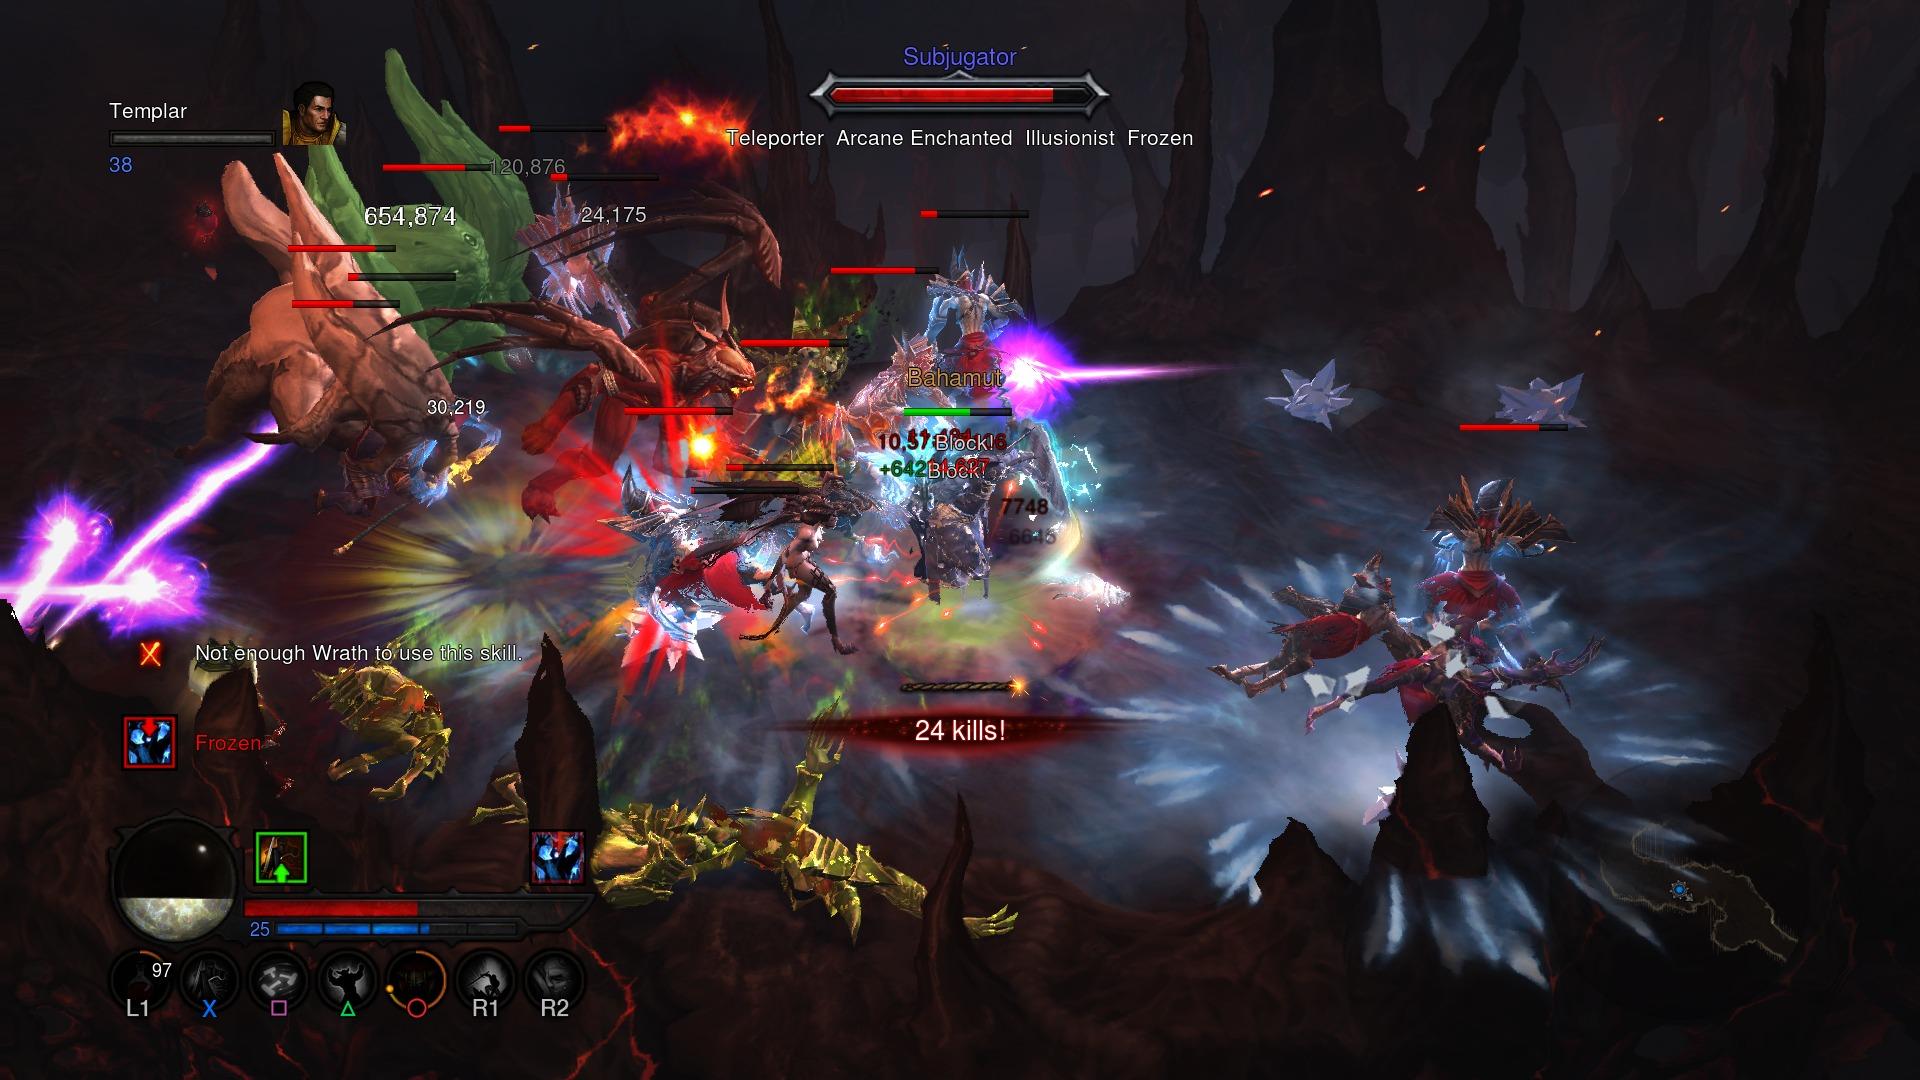 Diablo III: Reaper of Souls – Ultimate Evil Edition (English)_20140830021126